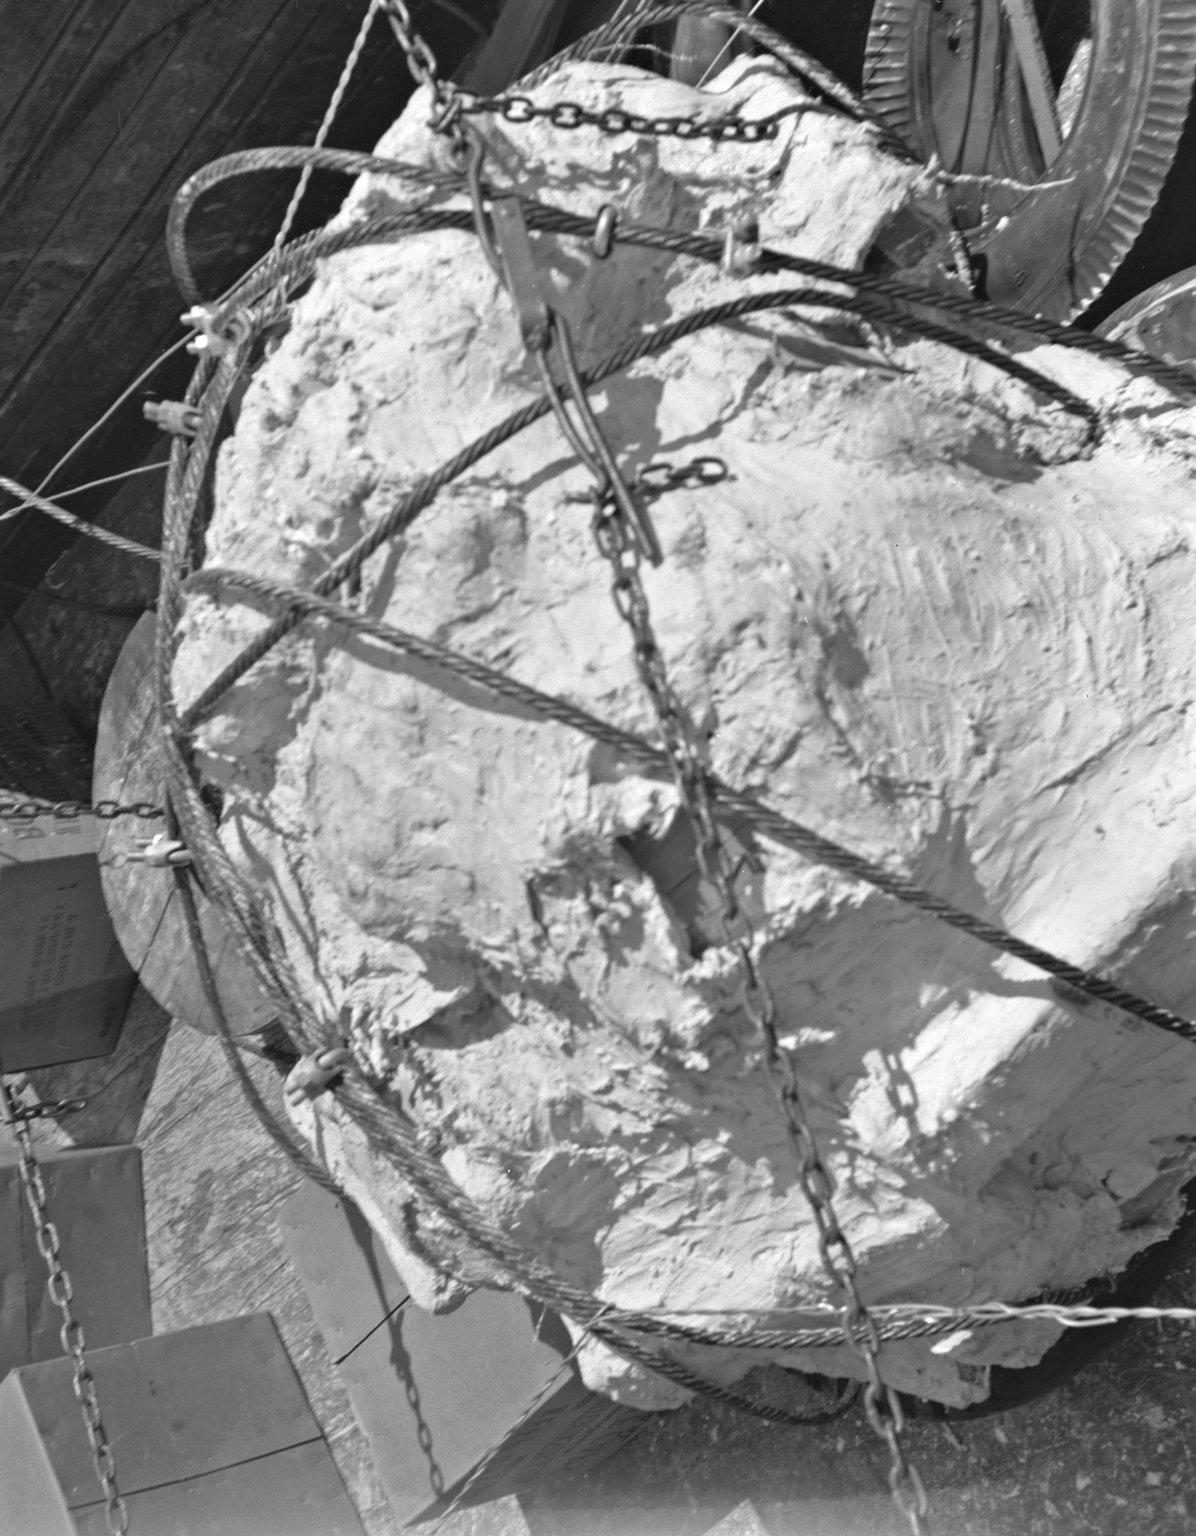 Specimen 'plastered' for removal